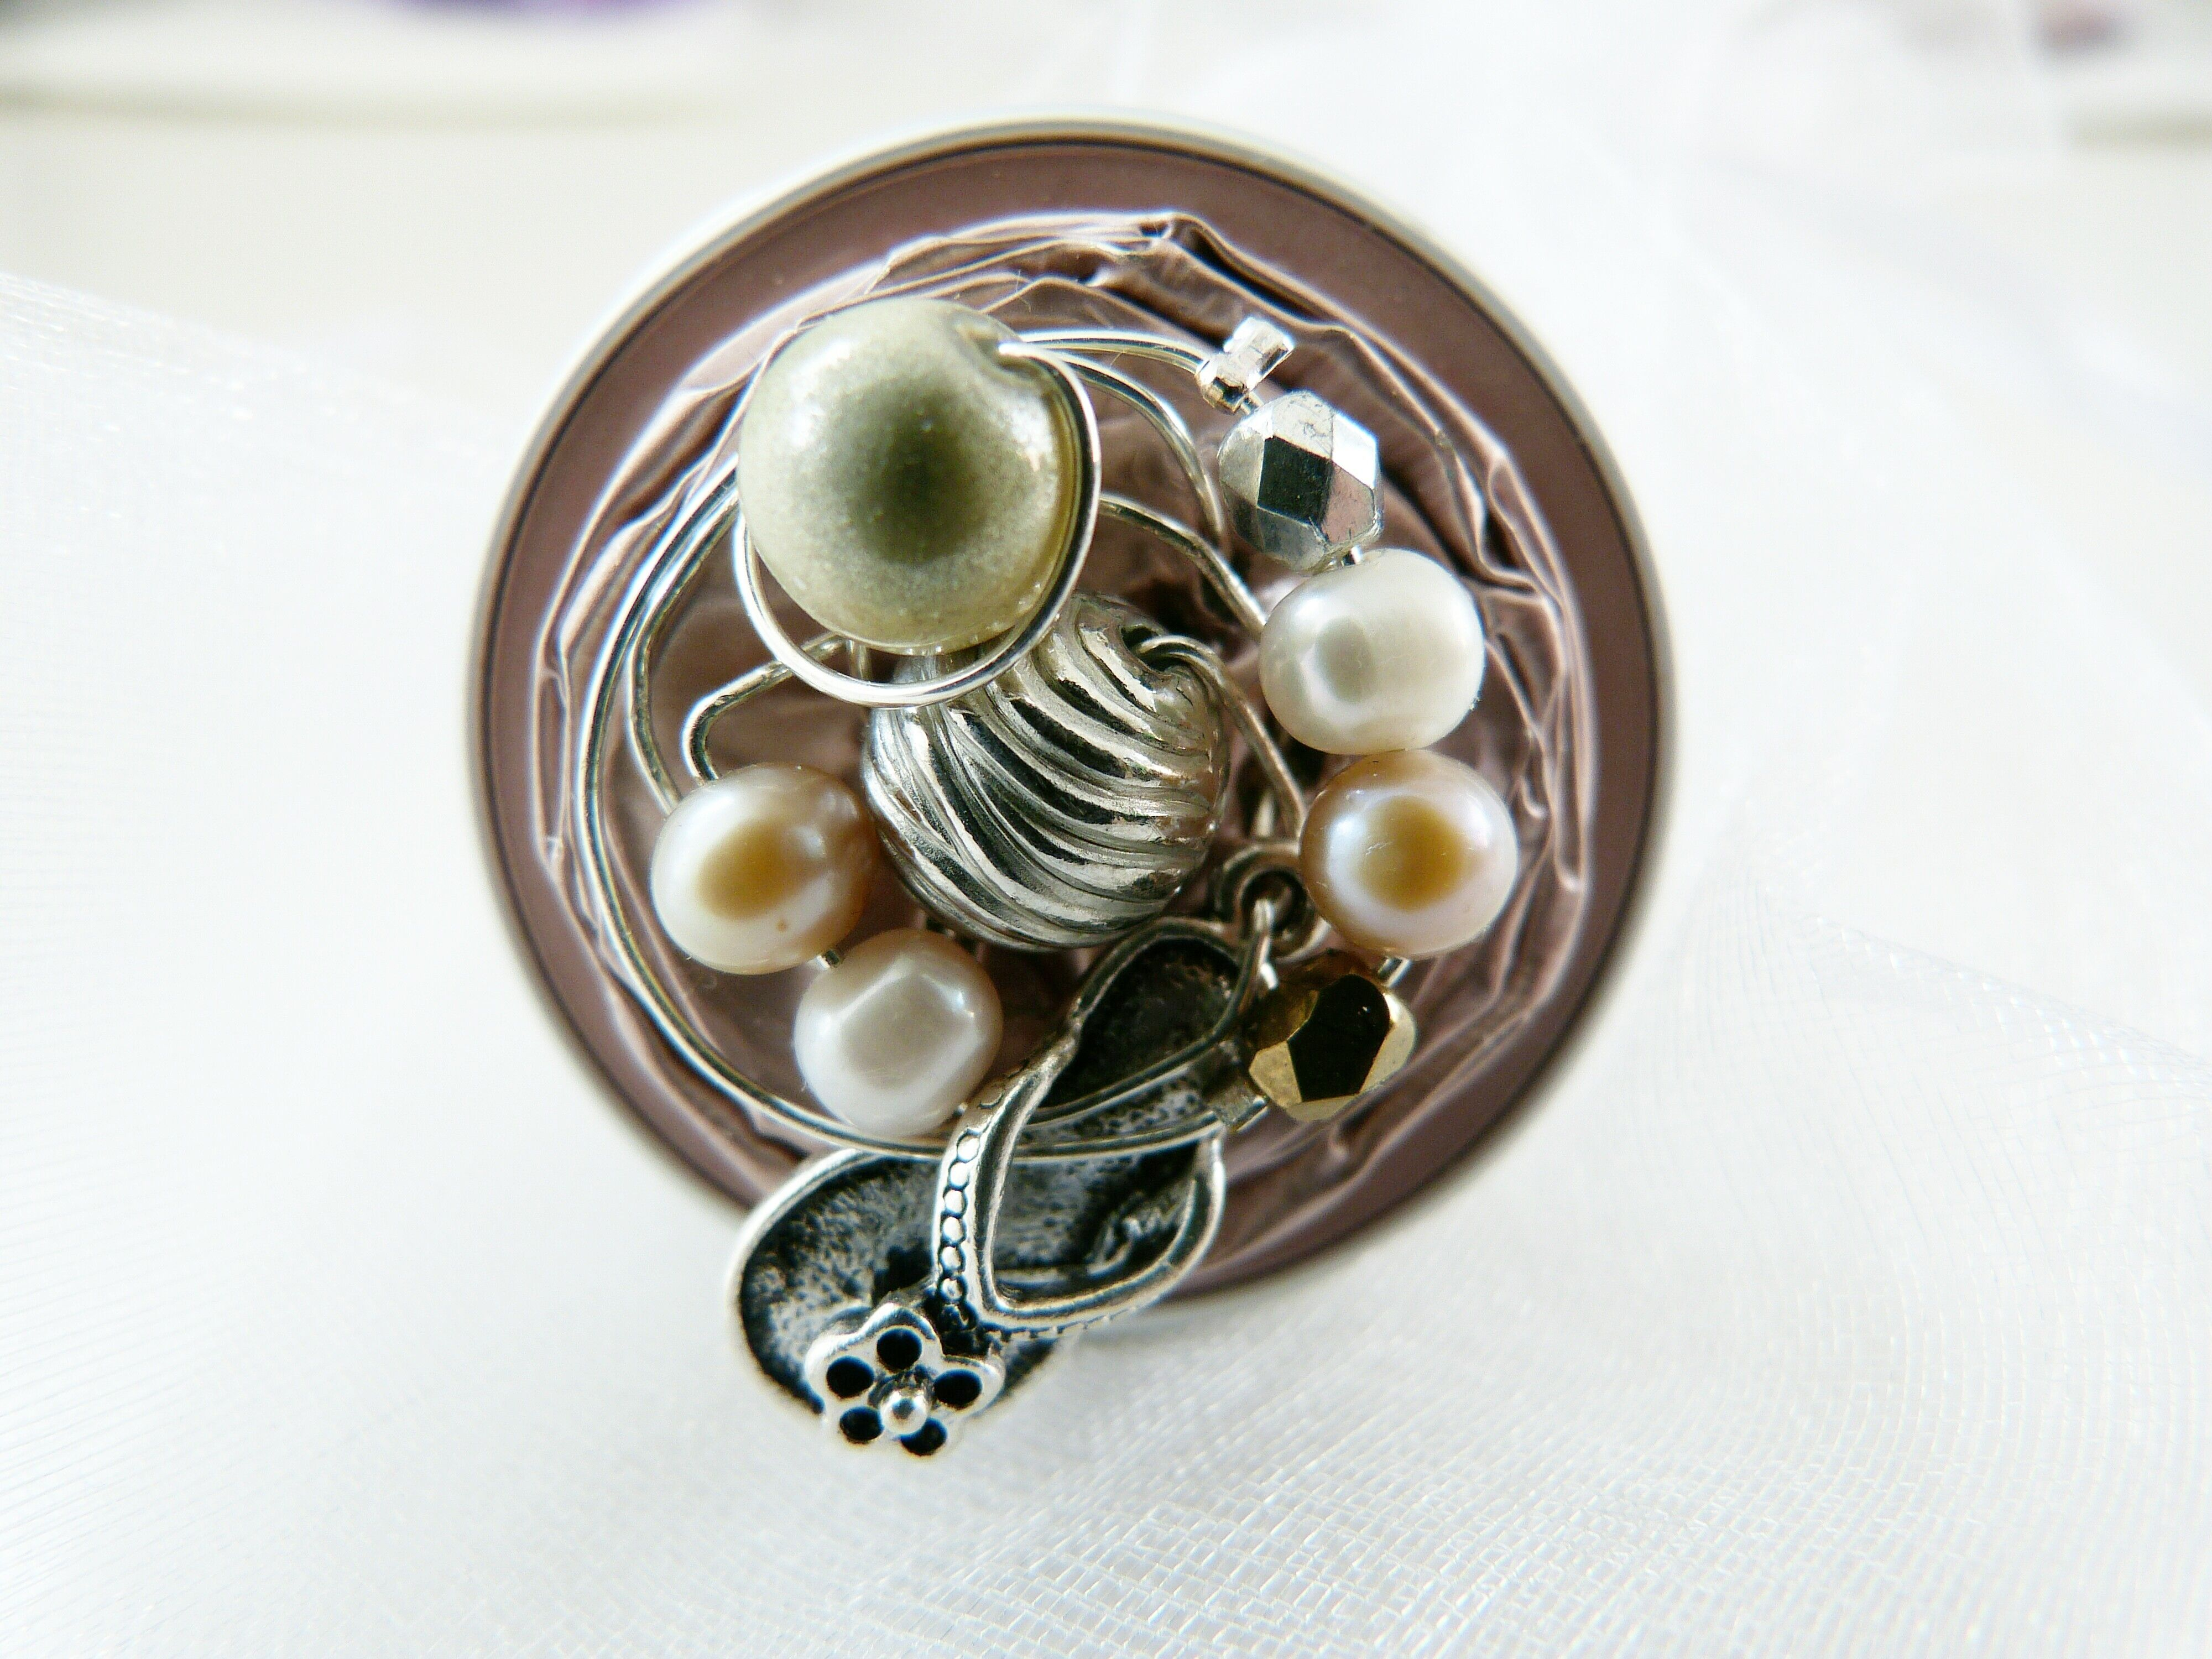 Nespresso Ring one of a kind recyling handmade   https://www.facebook.com/4UGeschenkeonline